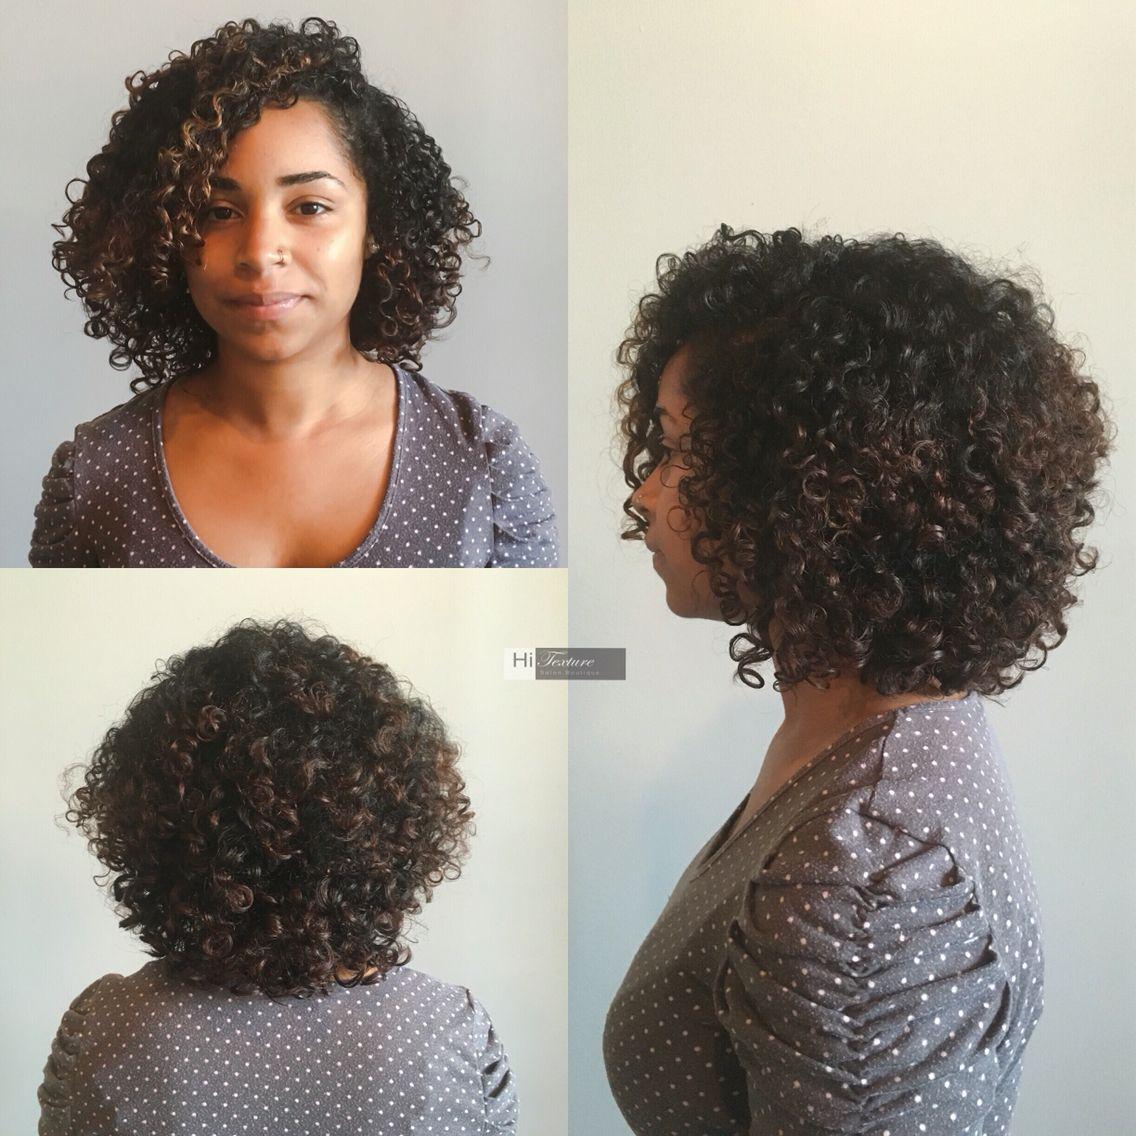 Pin On Micah Stylist At Hi Texture Hair Salon